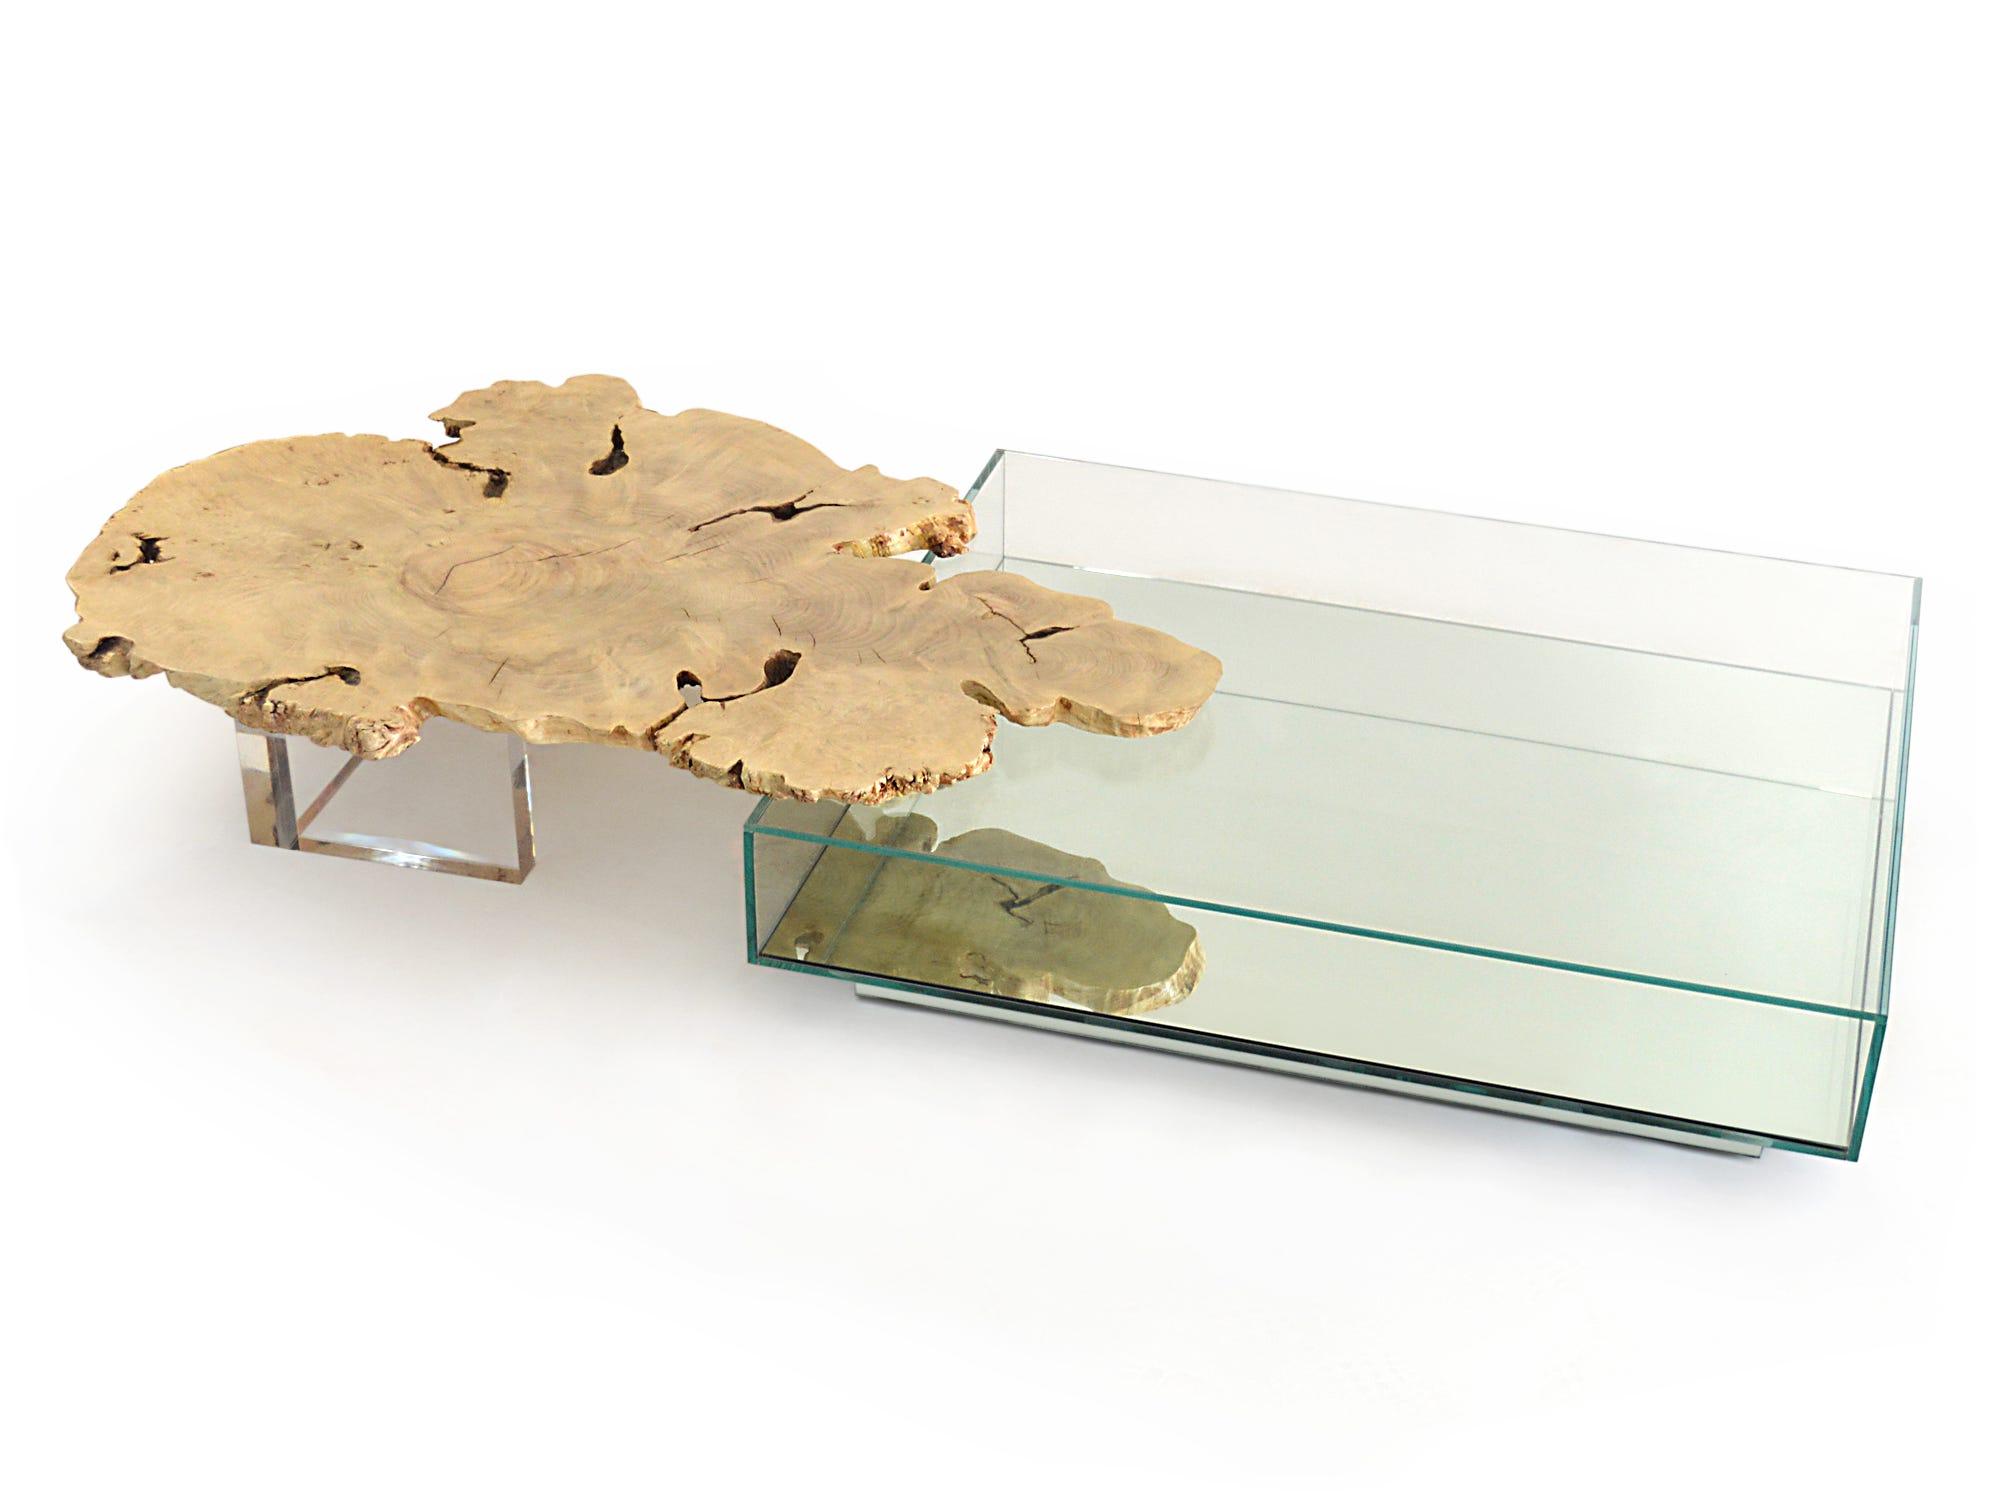 7 Main Coffee Table Styles A Coffee Table Is A Long Low Table By Anna Samygina Basics Of Interior Design Medium